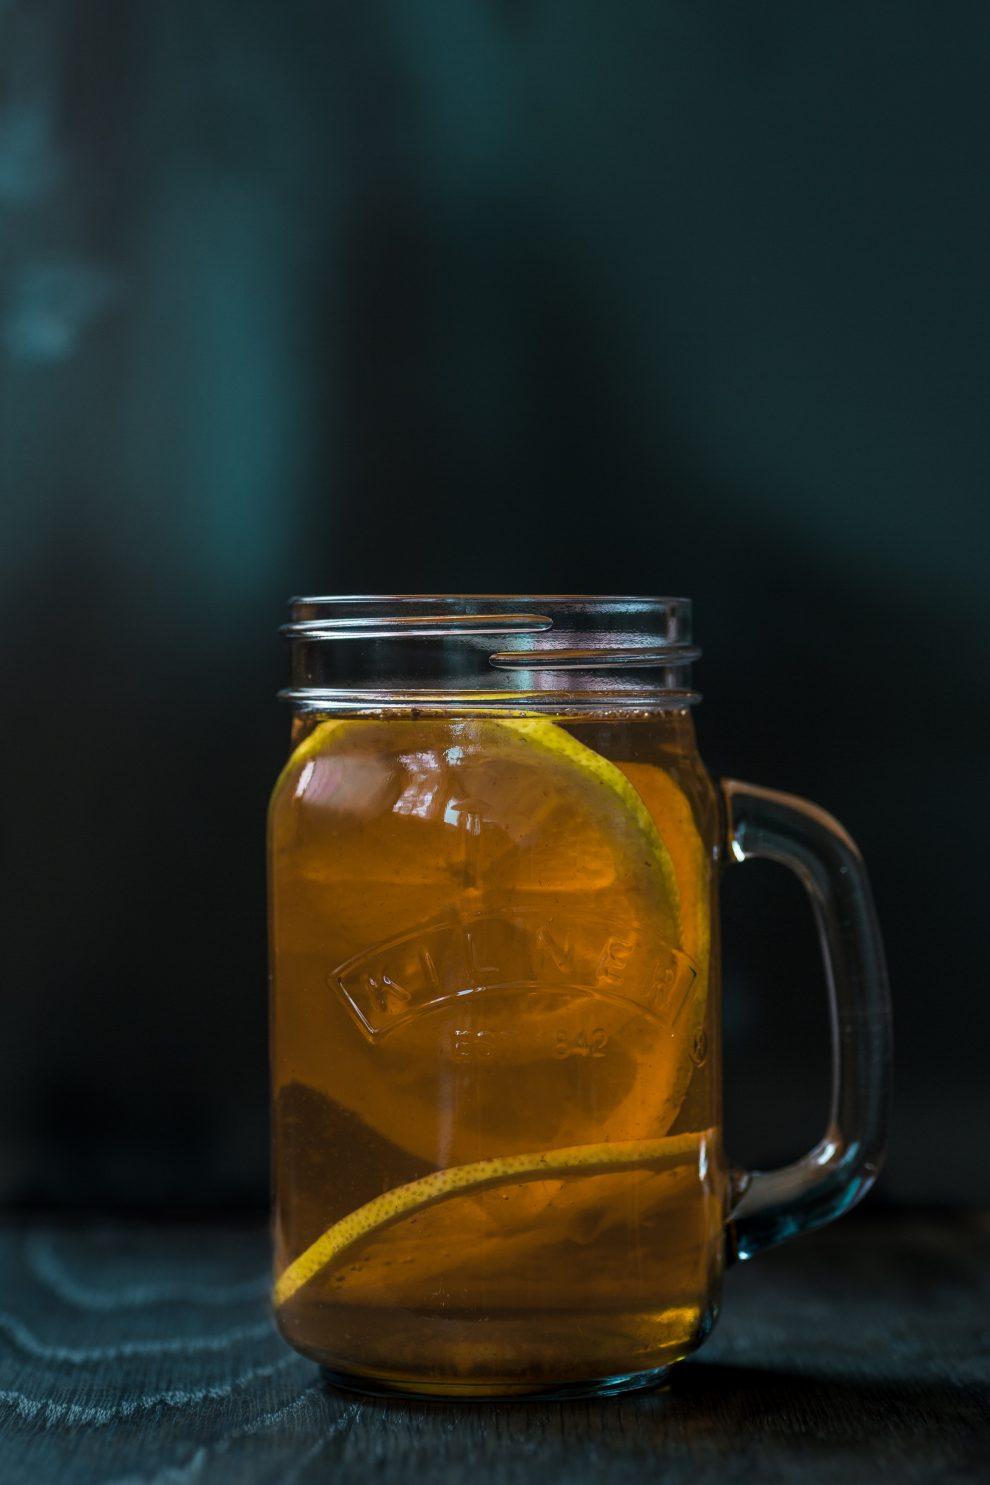 mincir avec une detox citron et curcuma